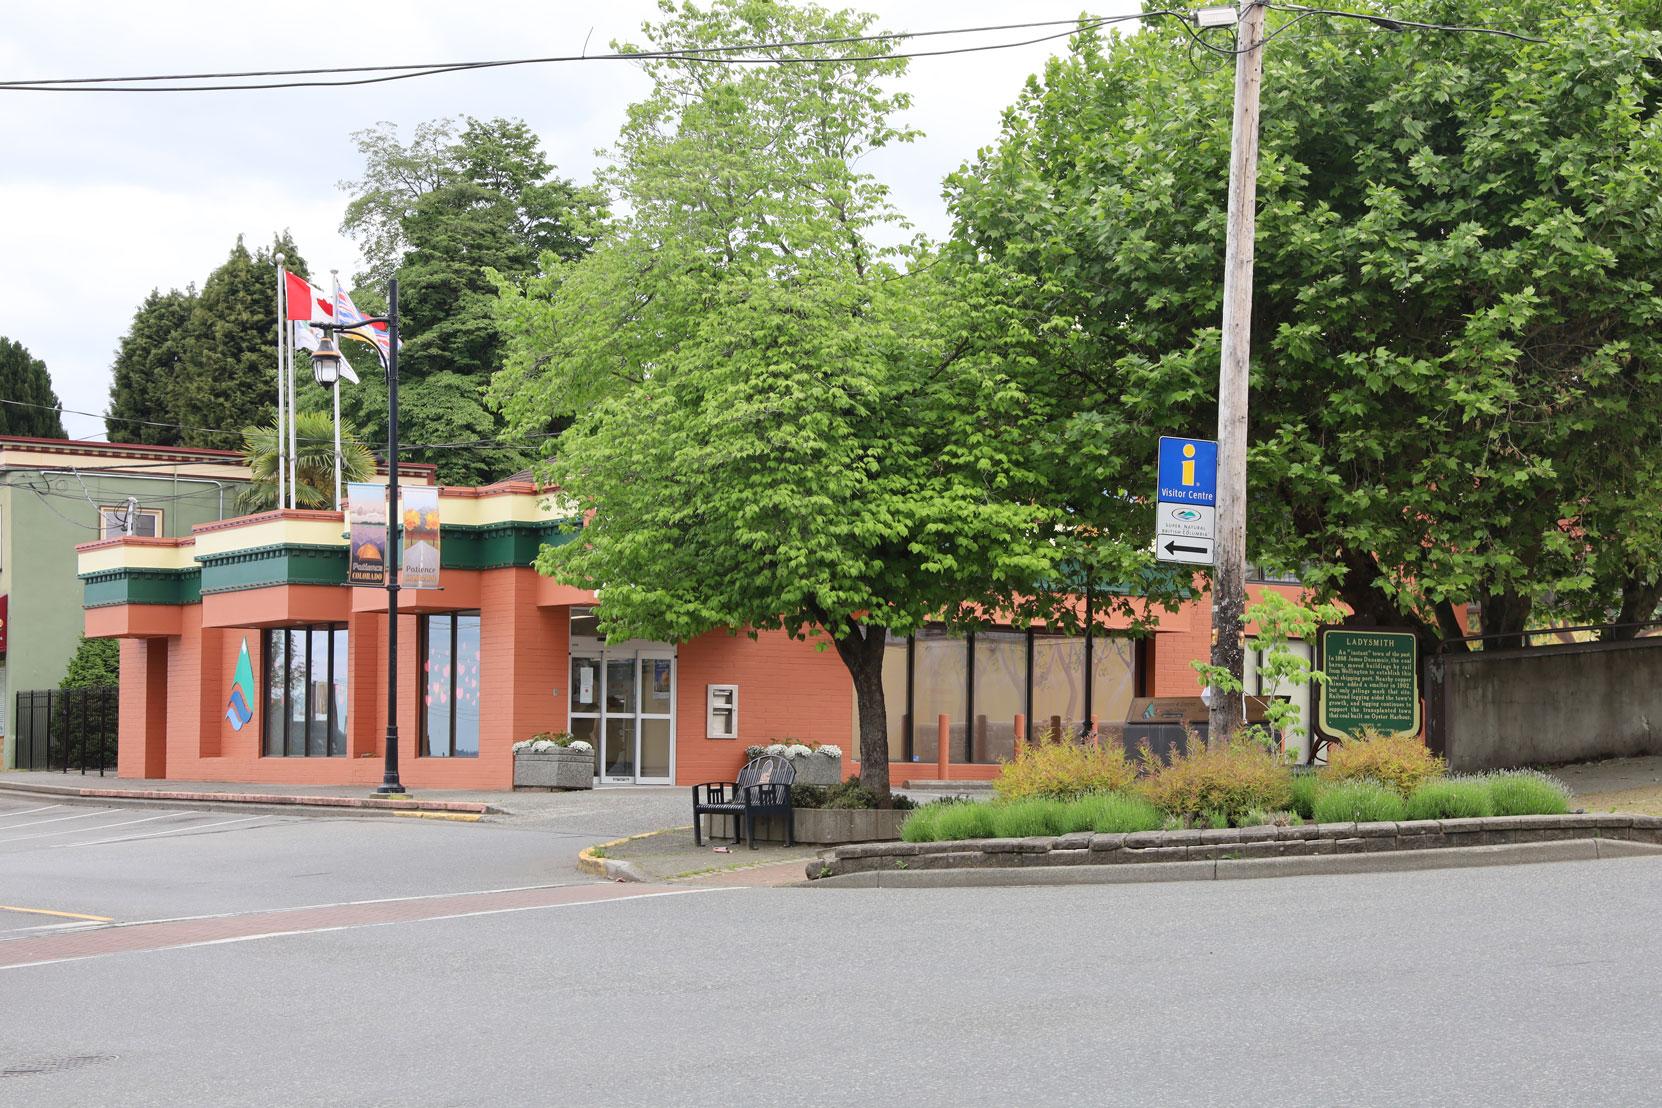 330 1st Avenue, Ladysmith, B.C., built in 1973. (photo: Mark Anderson)